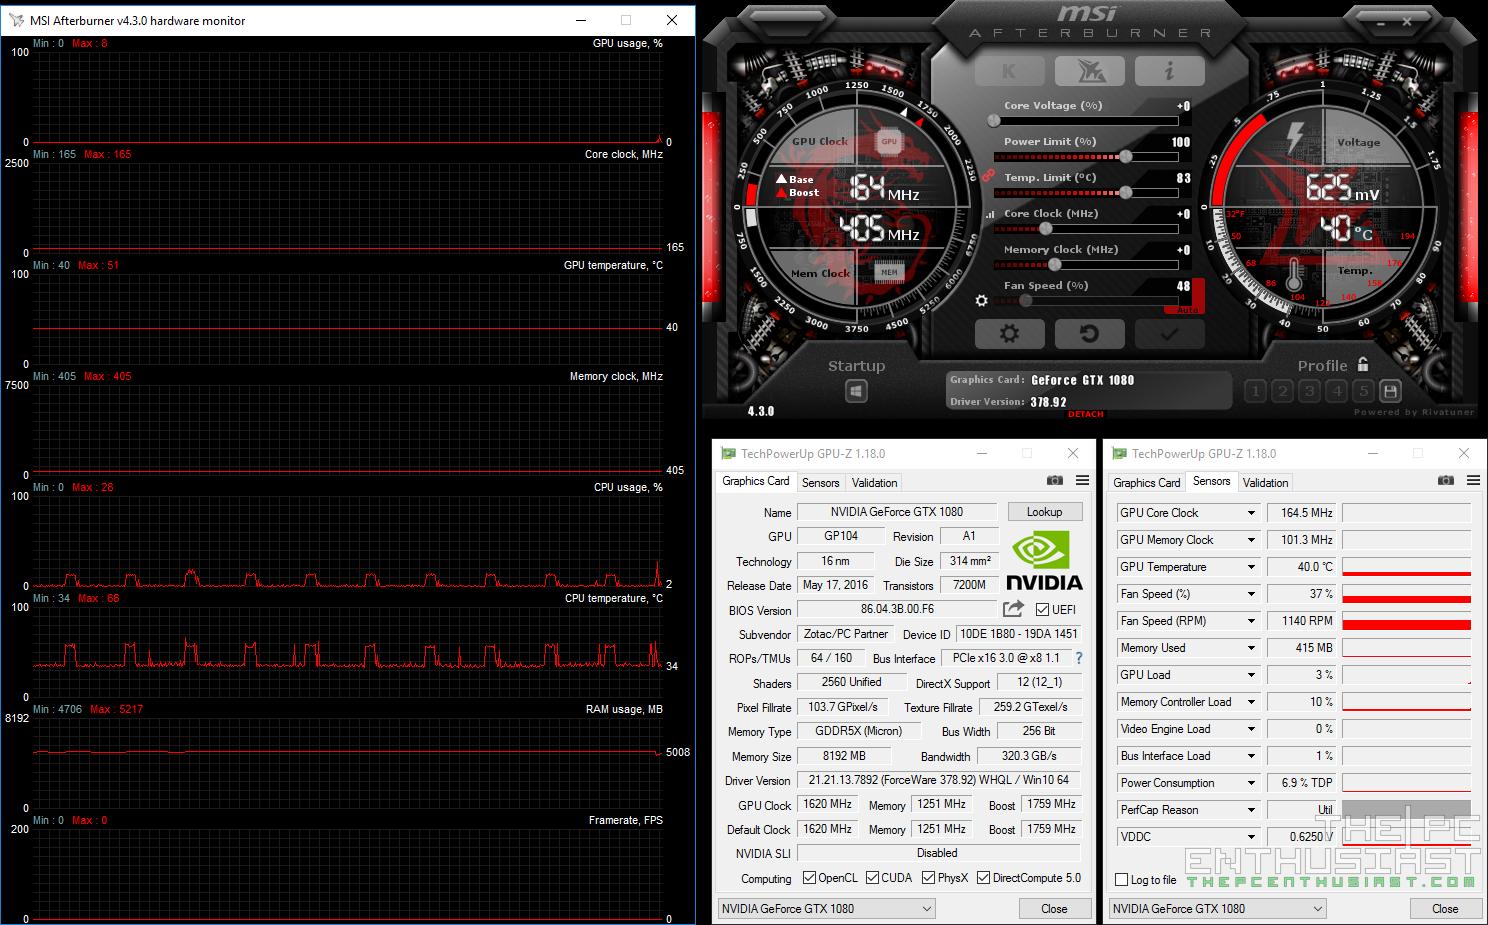 Zotac GeForce GTX 1080 Mini Review - Small But Powerful